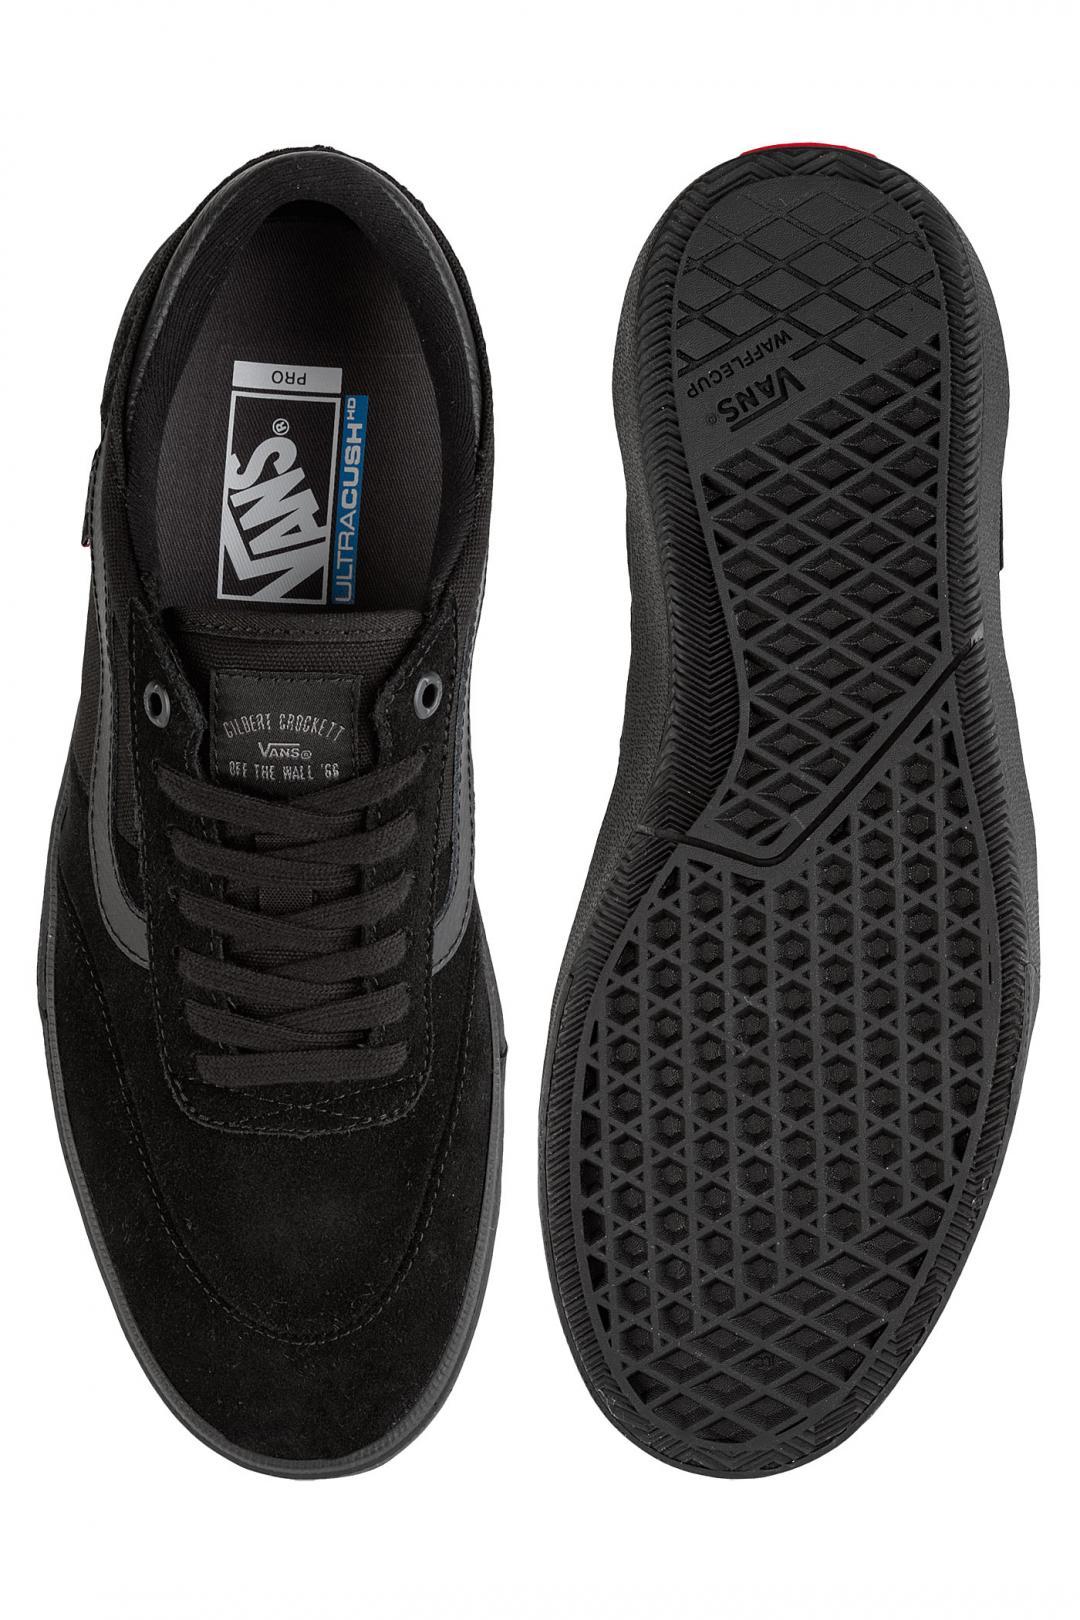 Uomo Vans Gilbert Crockett blackout | Sneakers low top